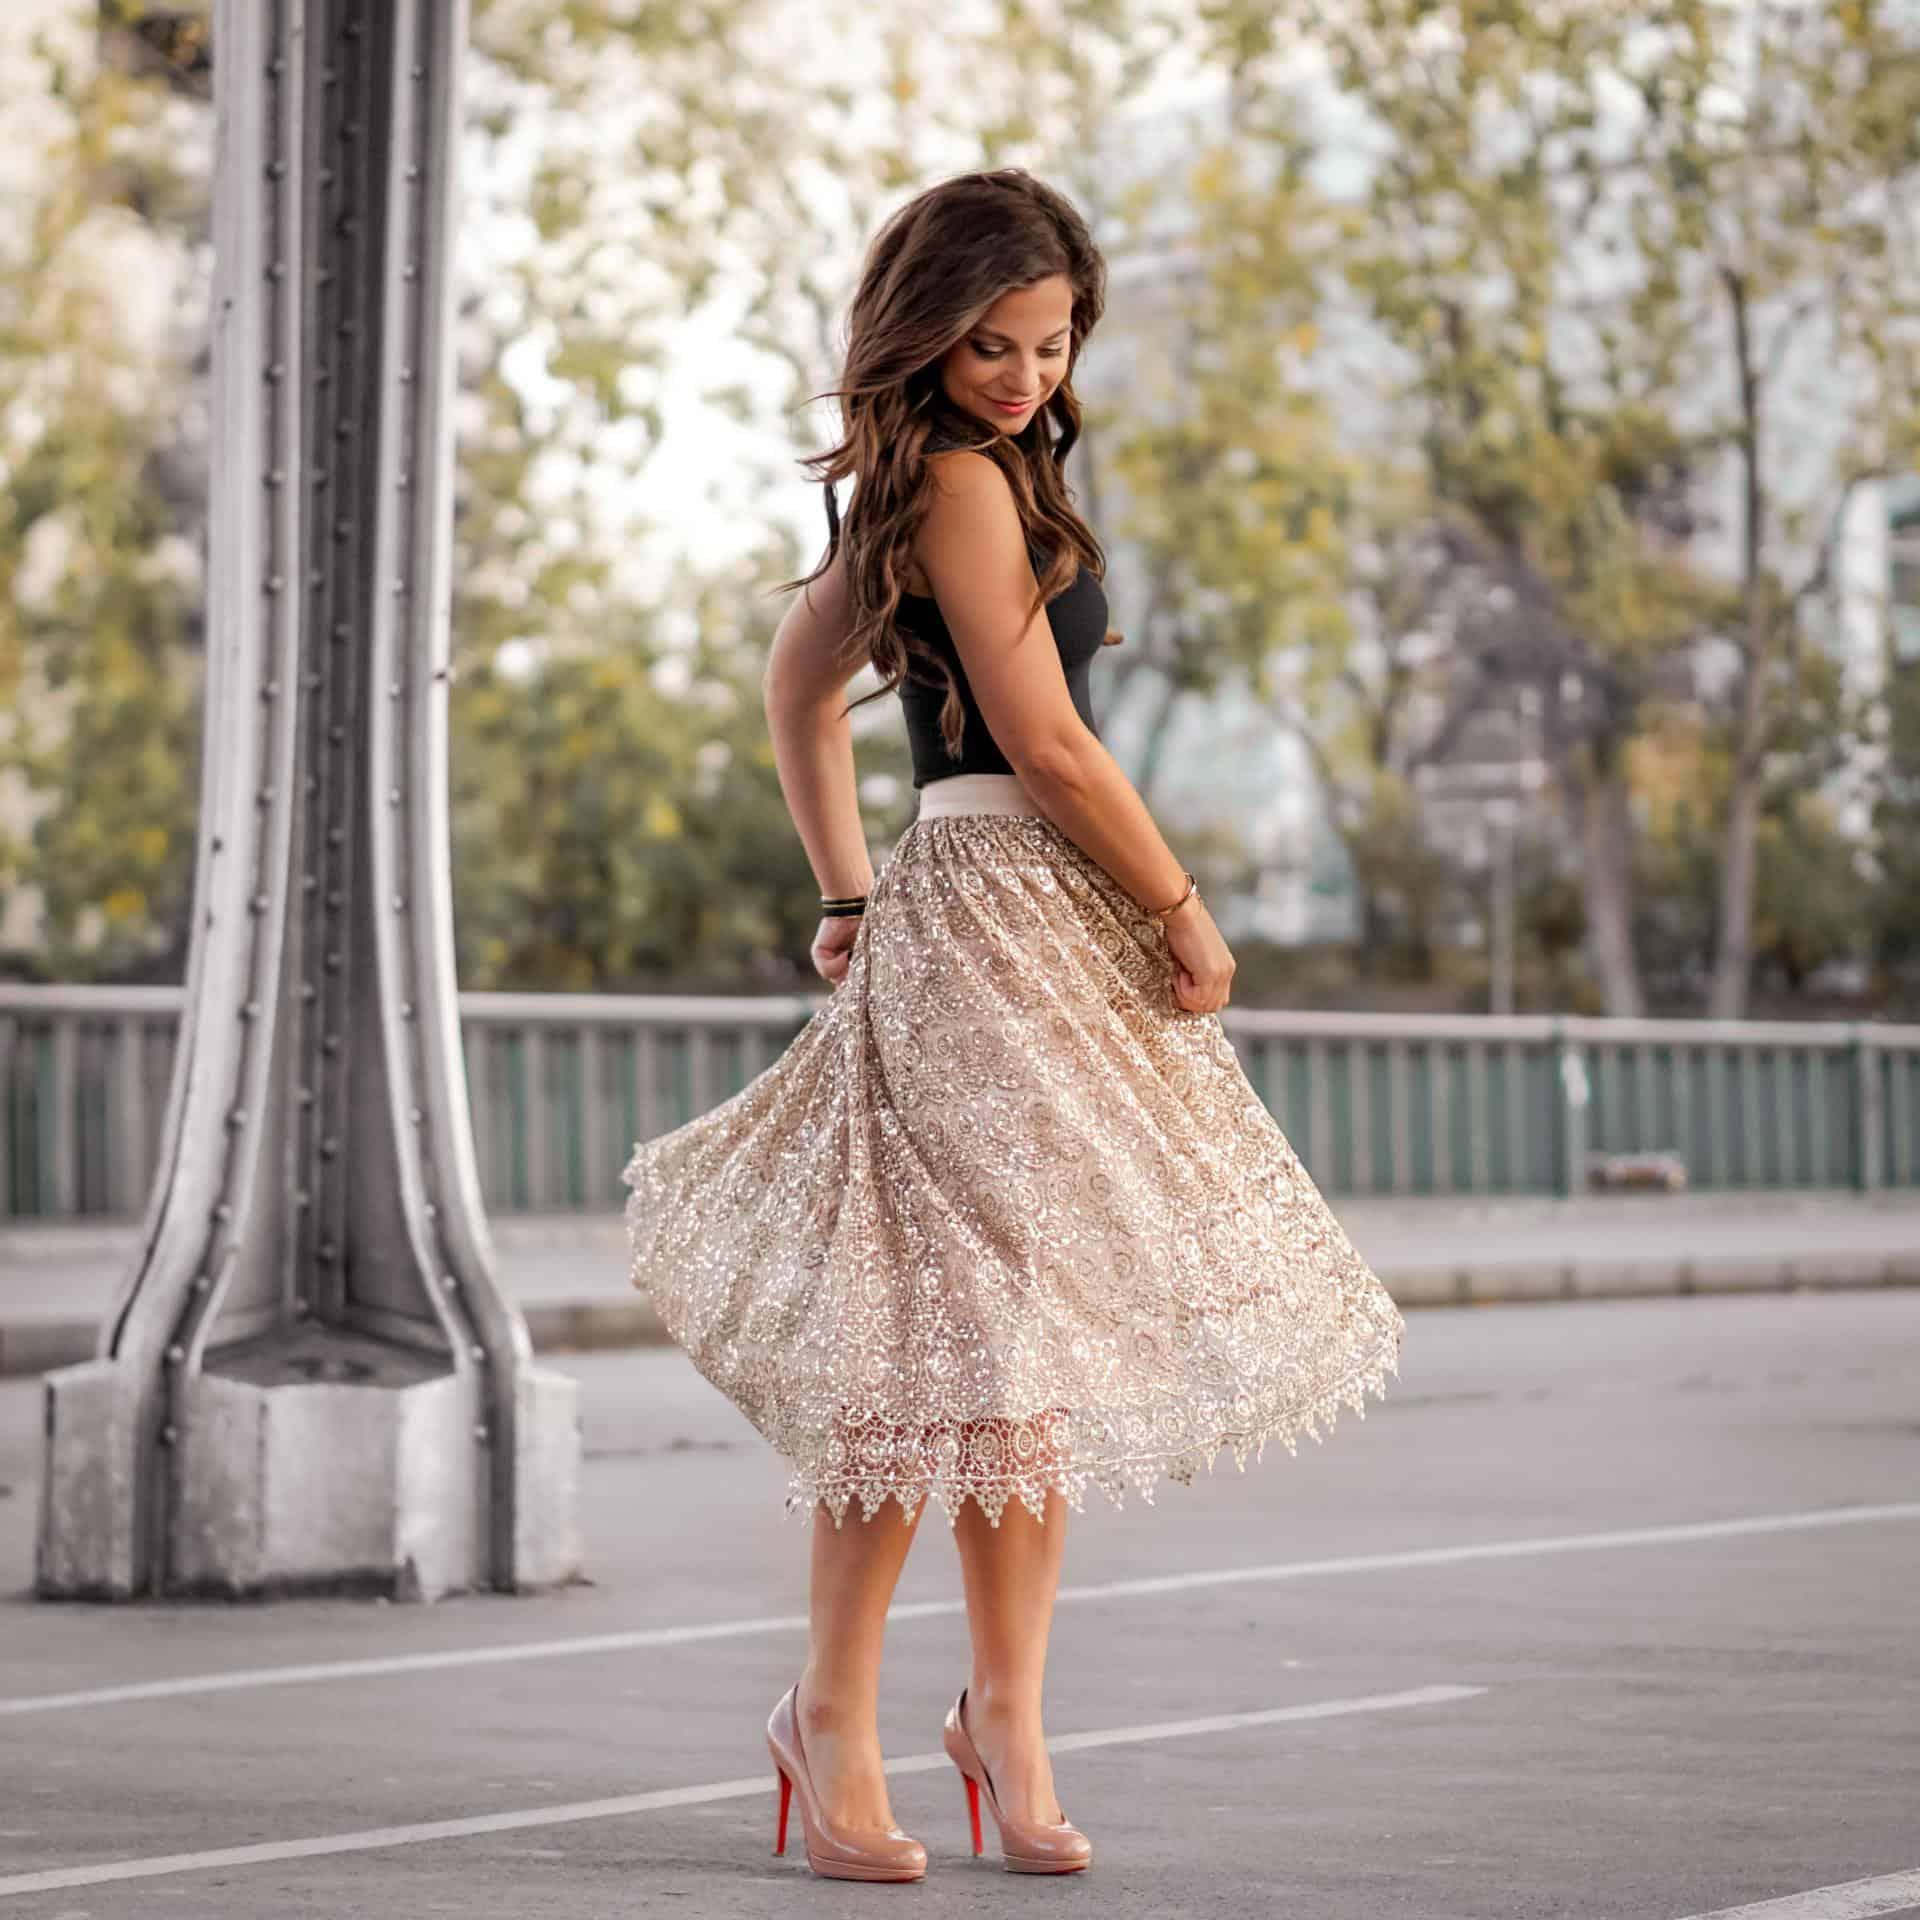 Petite in Paris twirls in Paris France paris fashion blogger